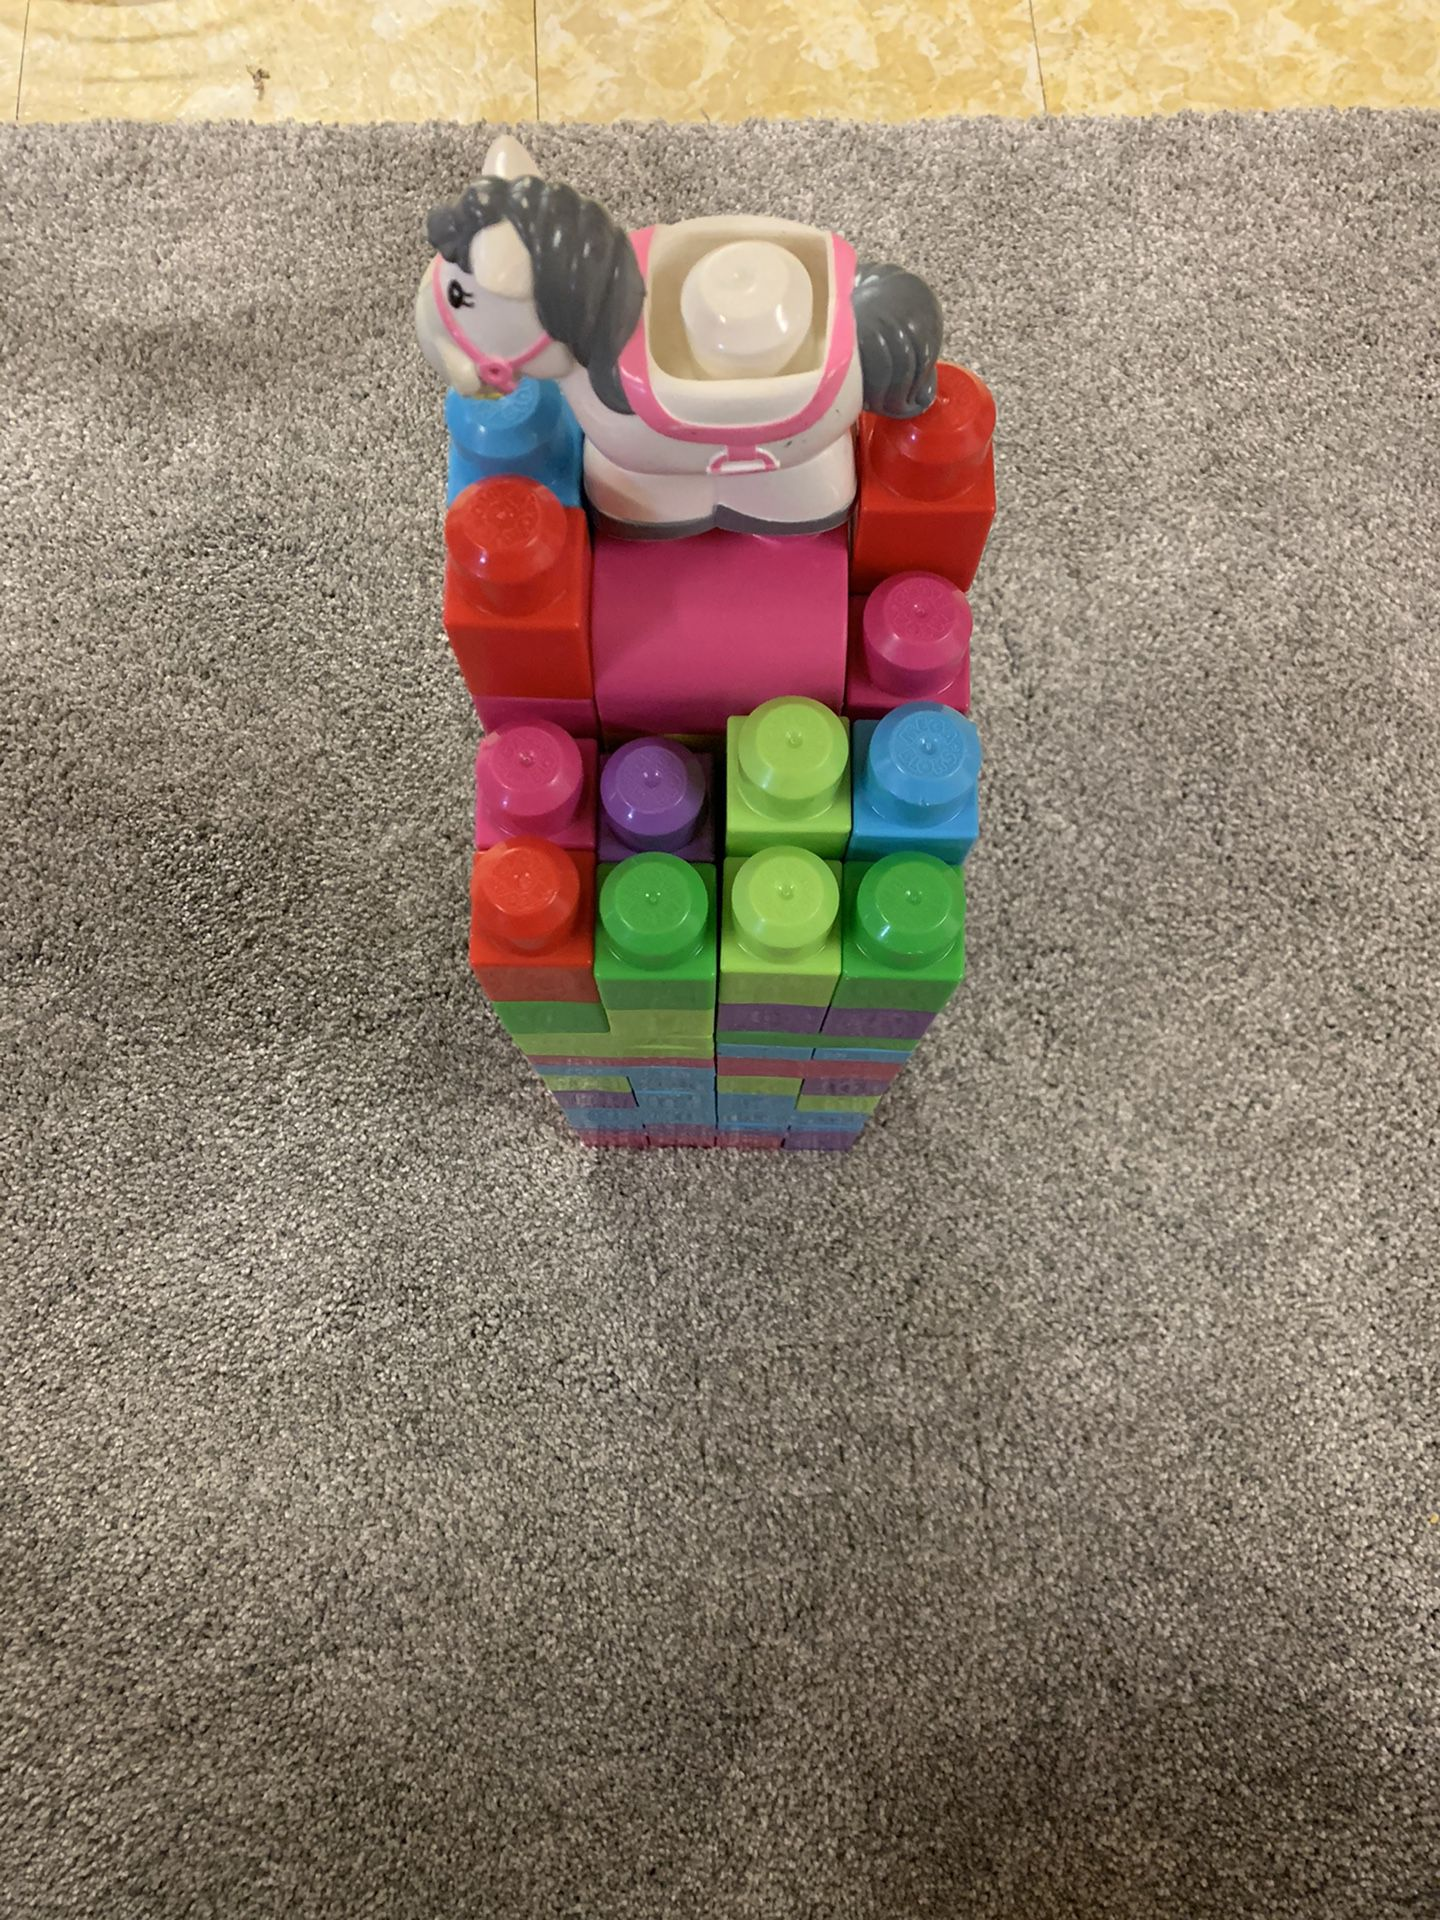 99 Peice Of Blocks